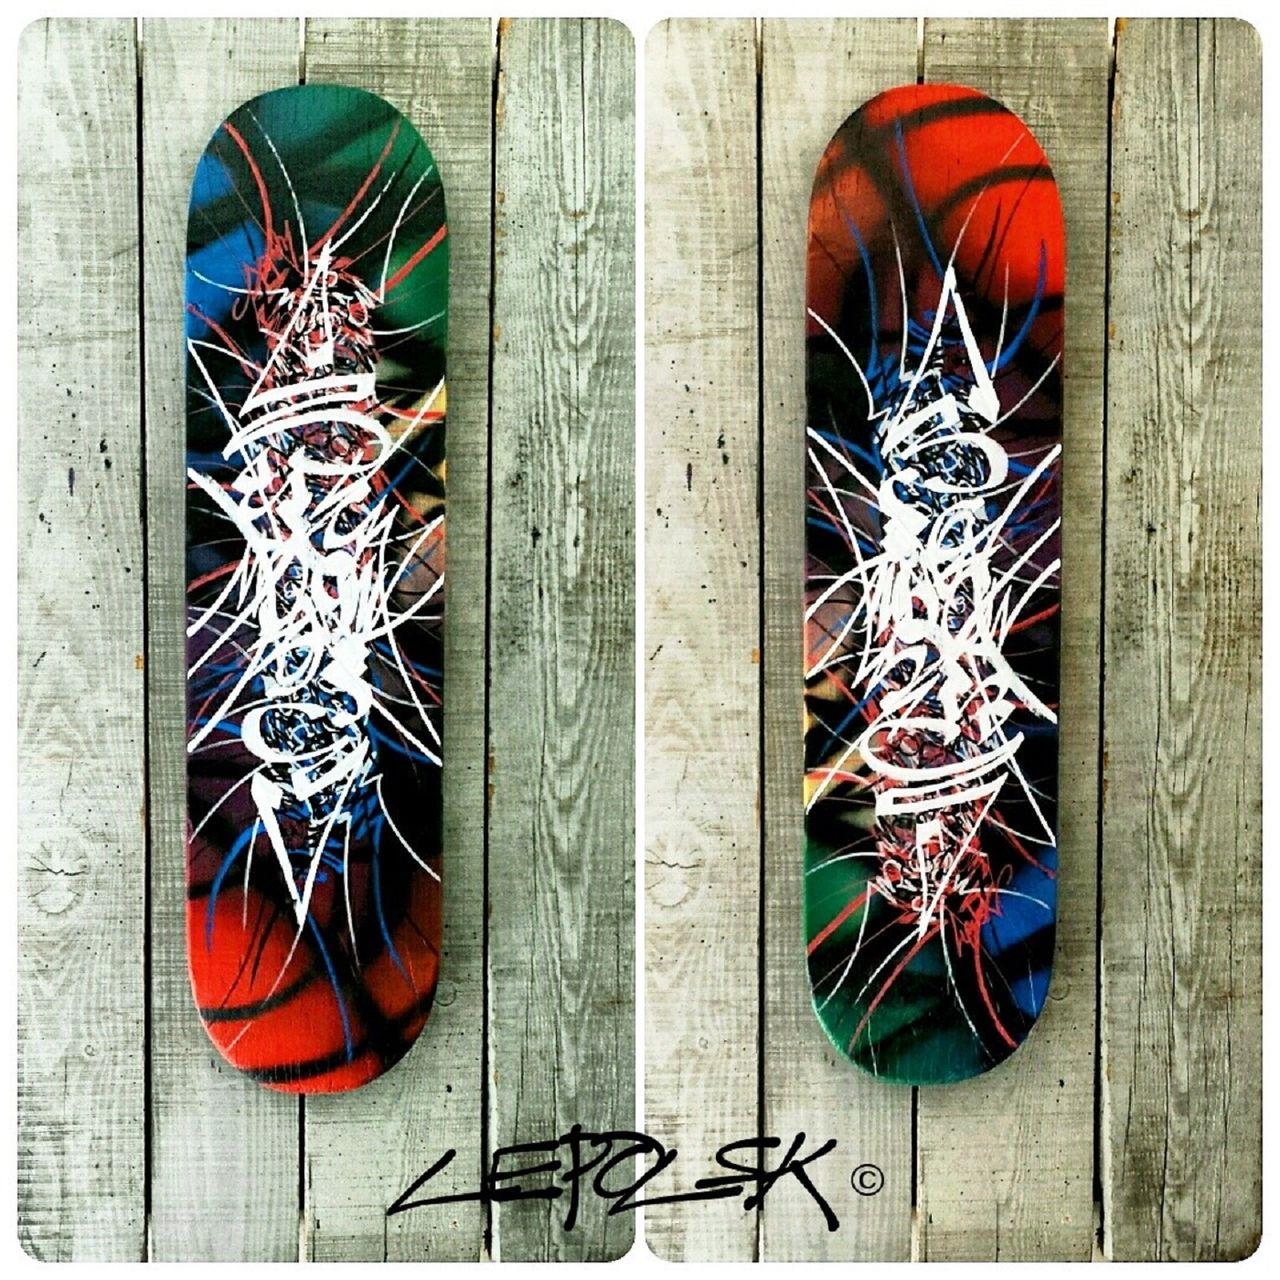 MK  Lepolsk Matuszewski Peinture Street Art ( Calligraffiti abstraite ) graffiti sur planche de skateboard recyclée.